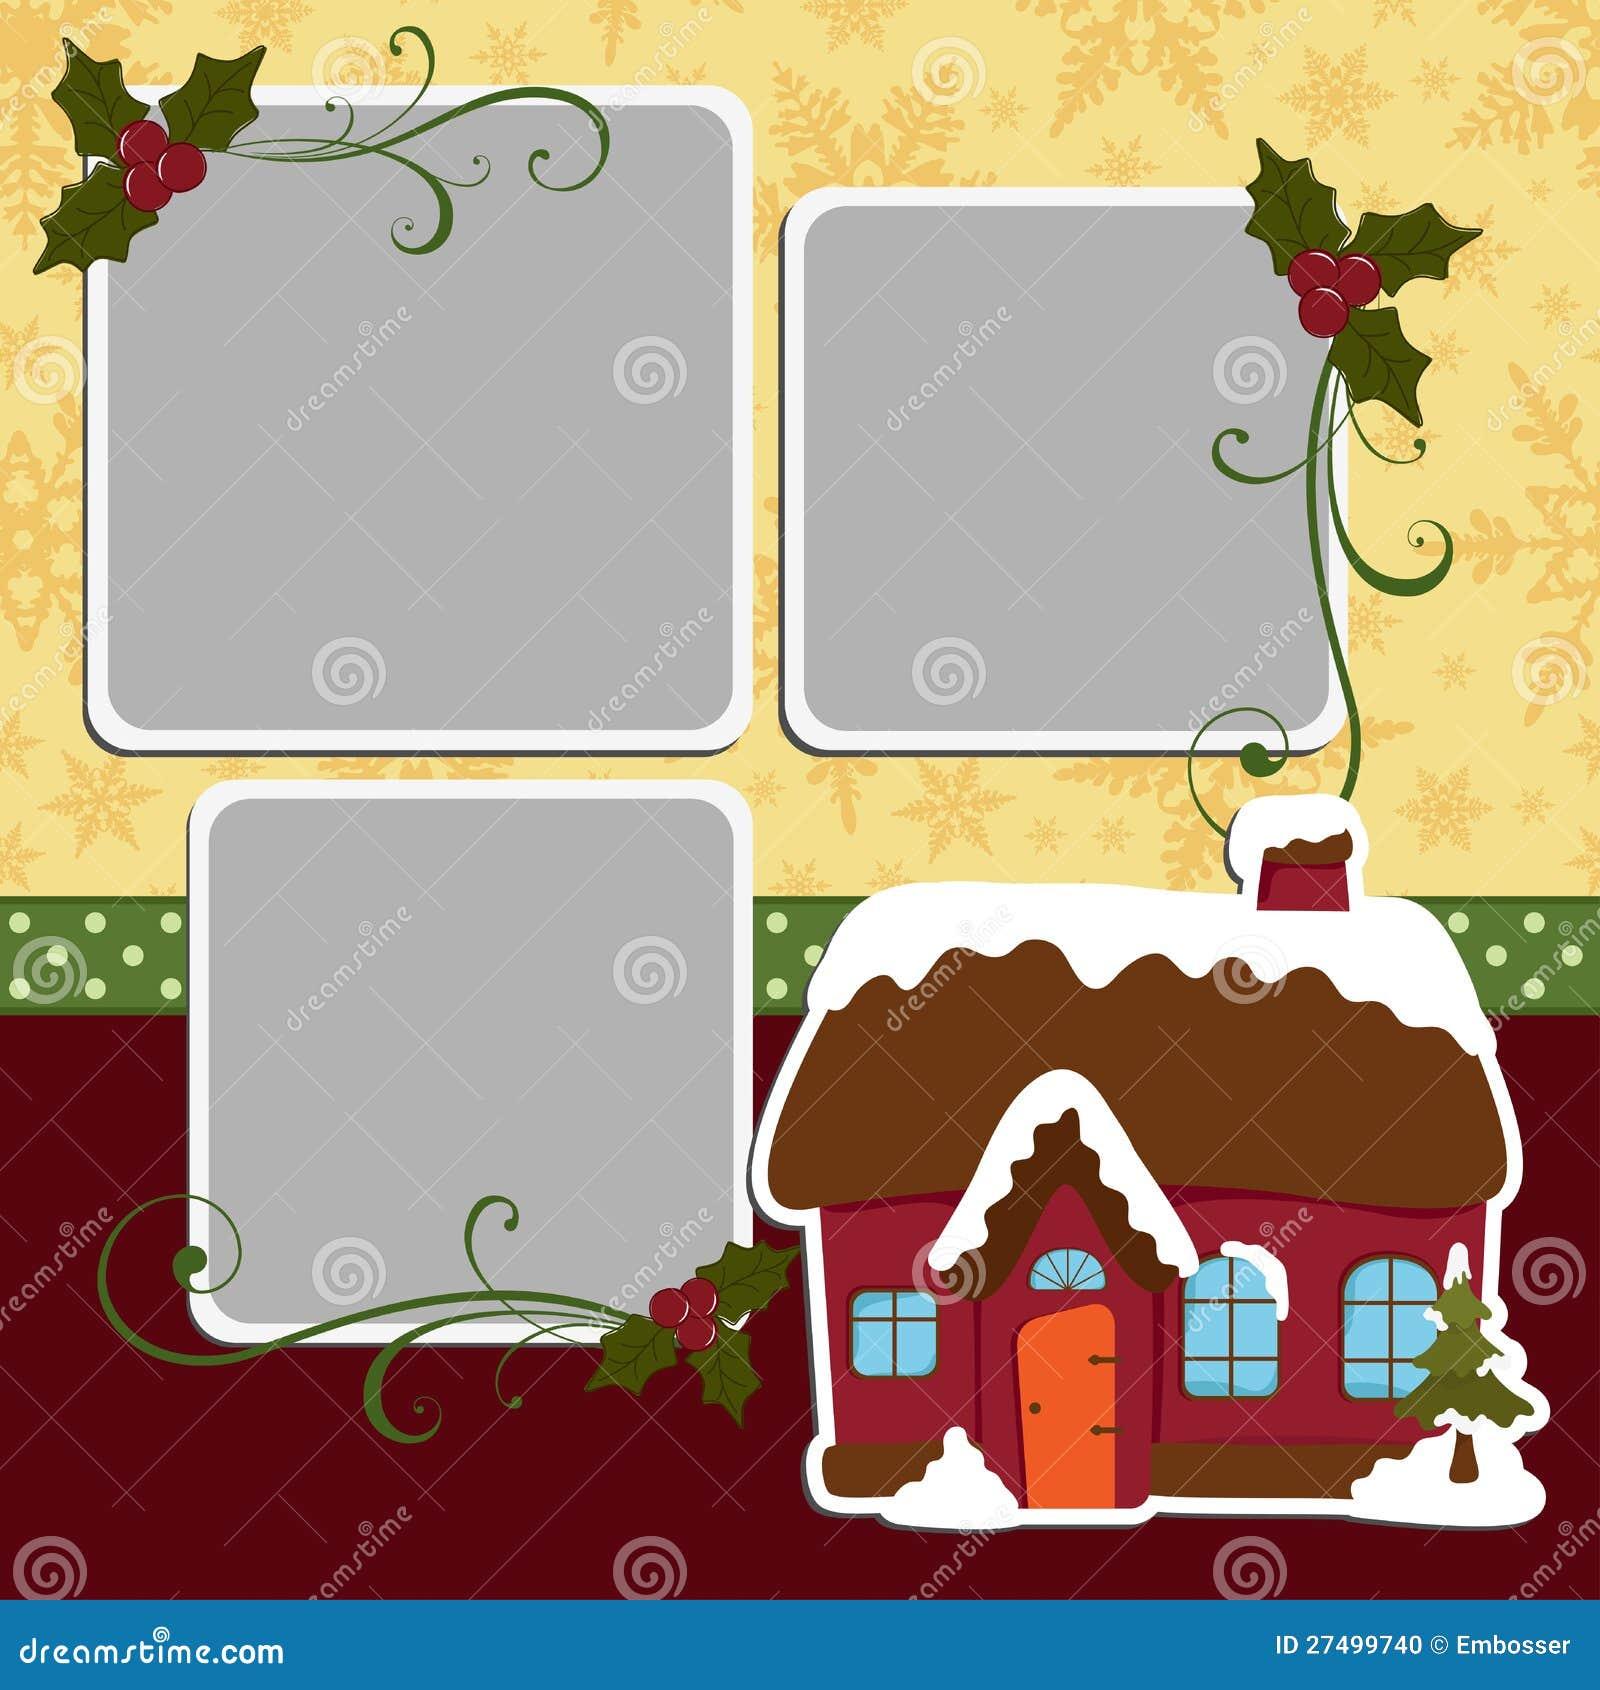 Cute Christmas Frame Template Stock Photo - Image: 27499740